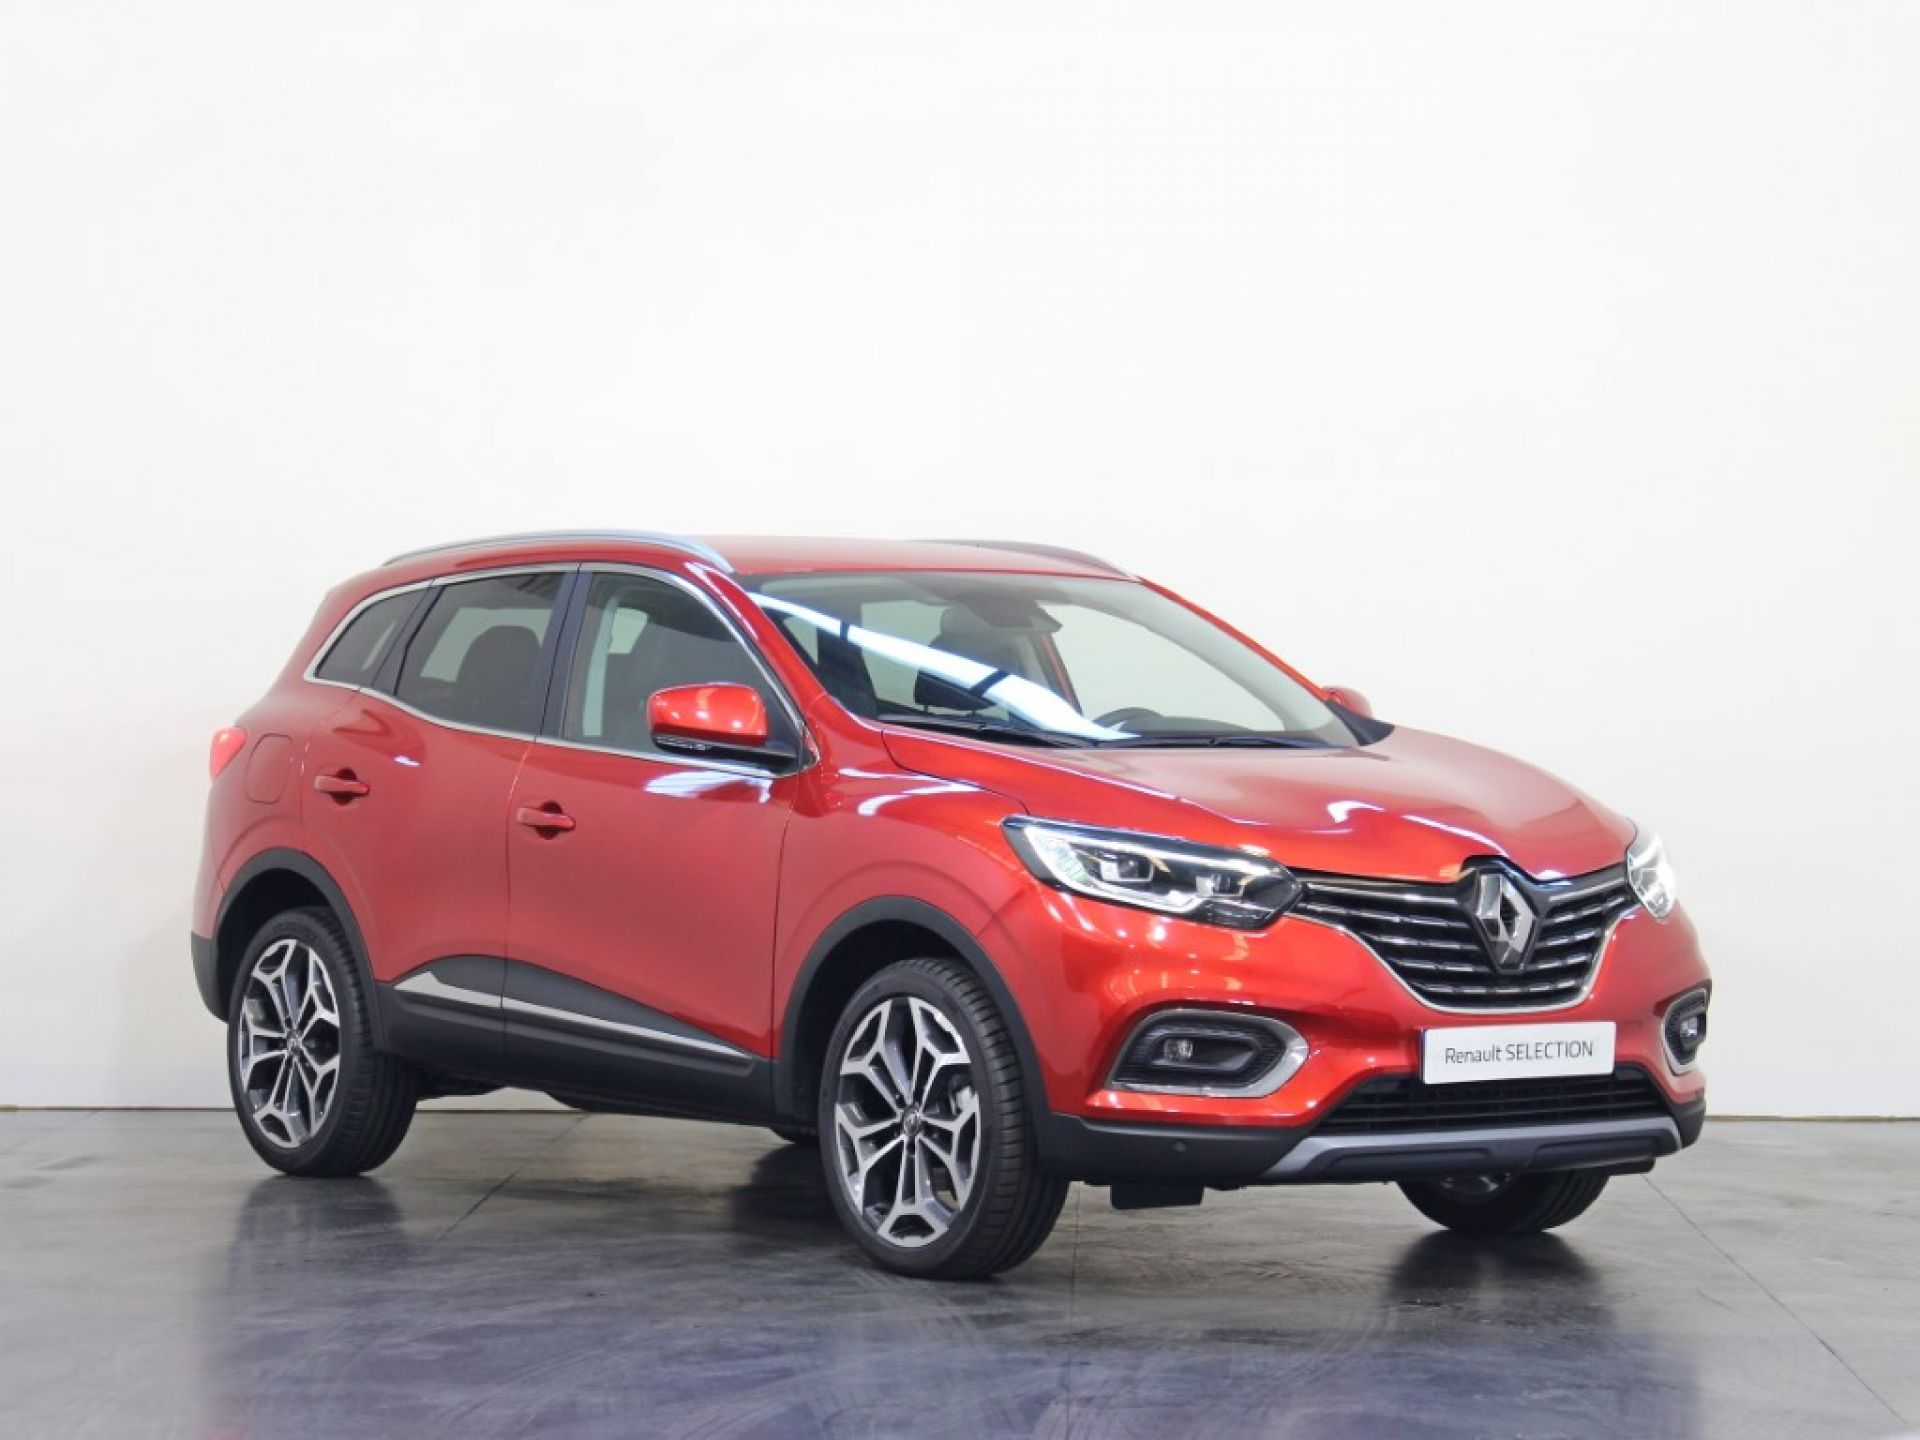 Renault Kadjar 1.3 TCe 140 FAP Intens segunda mão Porto